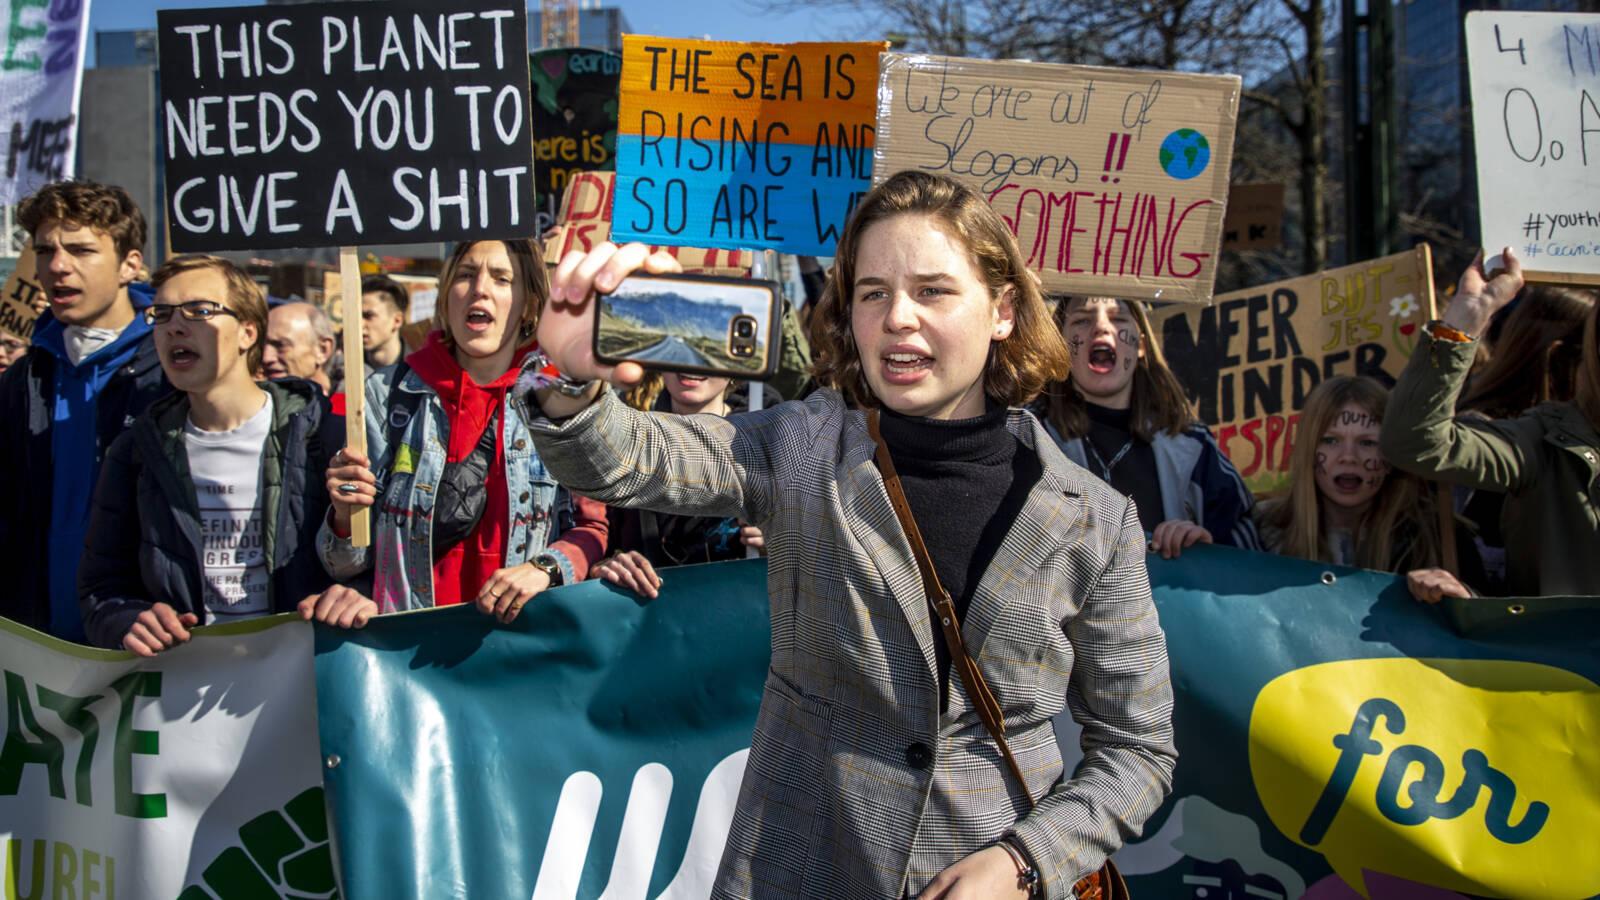 Anuna De Wever at Belgian pro-climate demonstration, AFP photo